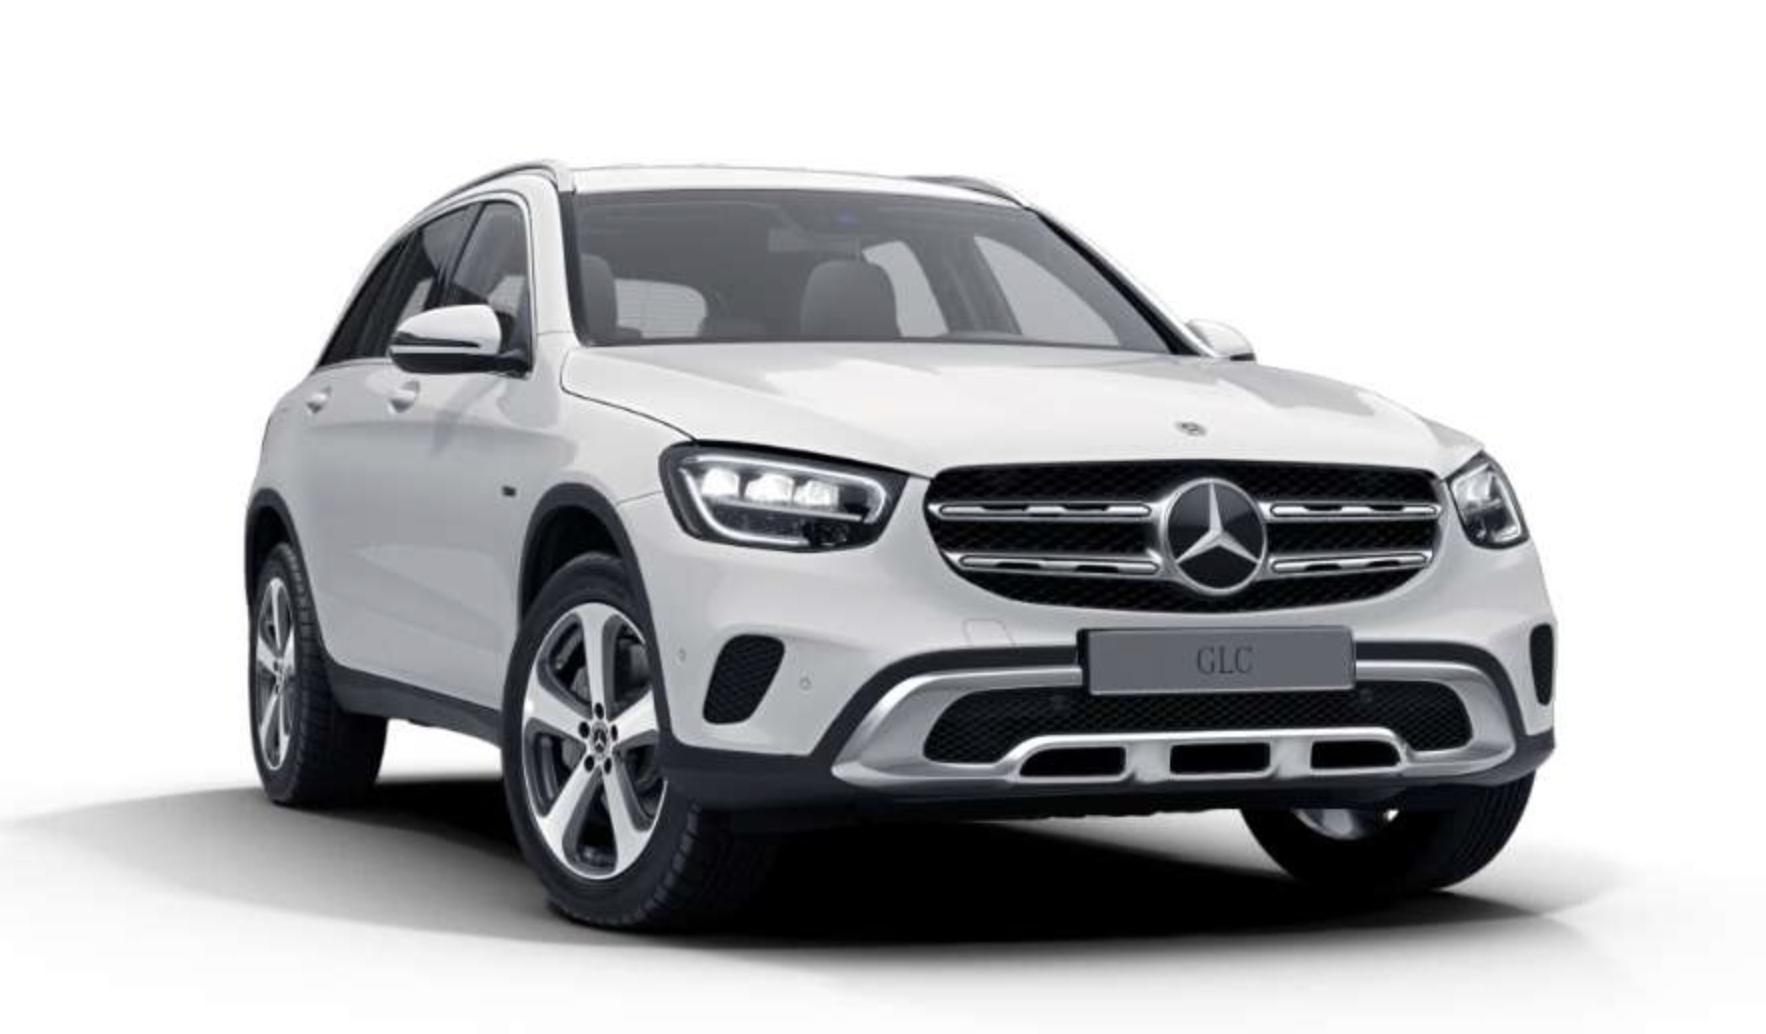 [Gewerbeleasing] Mercedes-Benz GLC 300 e 4MATIC für 199€ netto im Monat (LF 0,33) bei Lueg